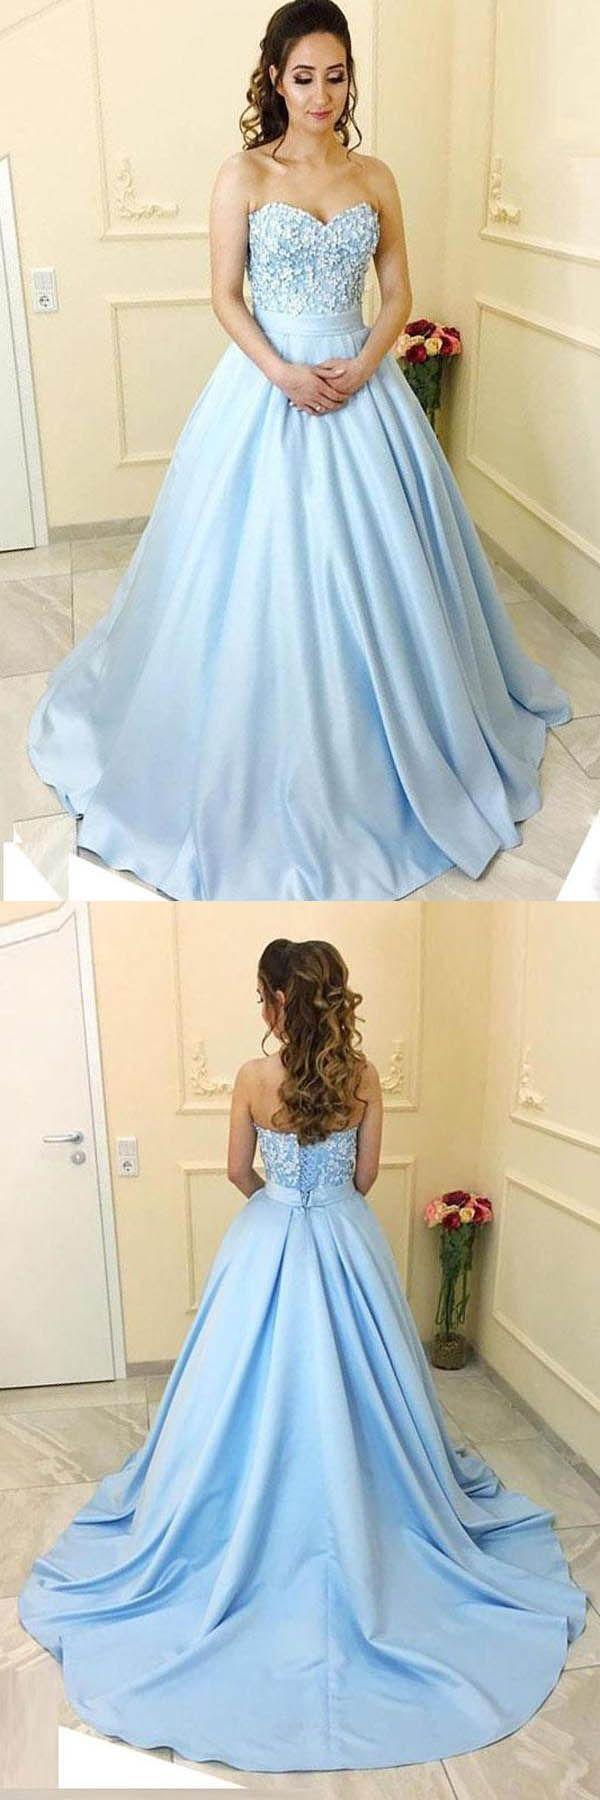 Stunning |pinterest: @BossUpRoyally [Flo Angel] #promdresses | prom ...